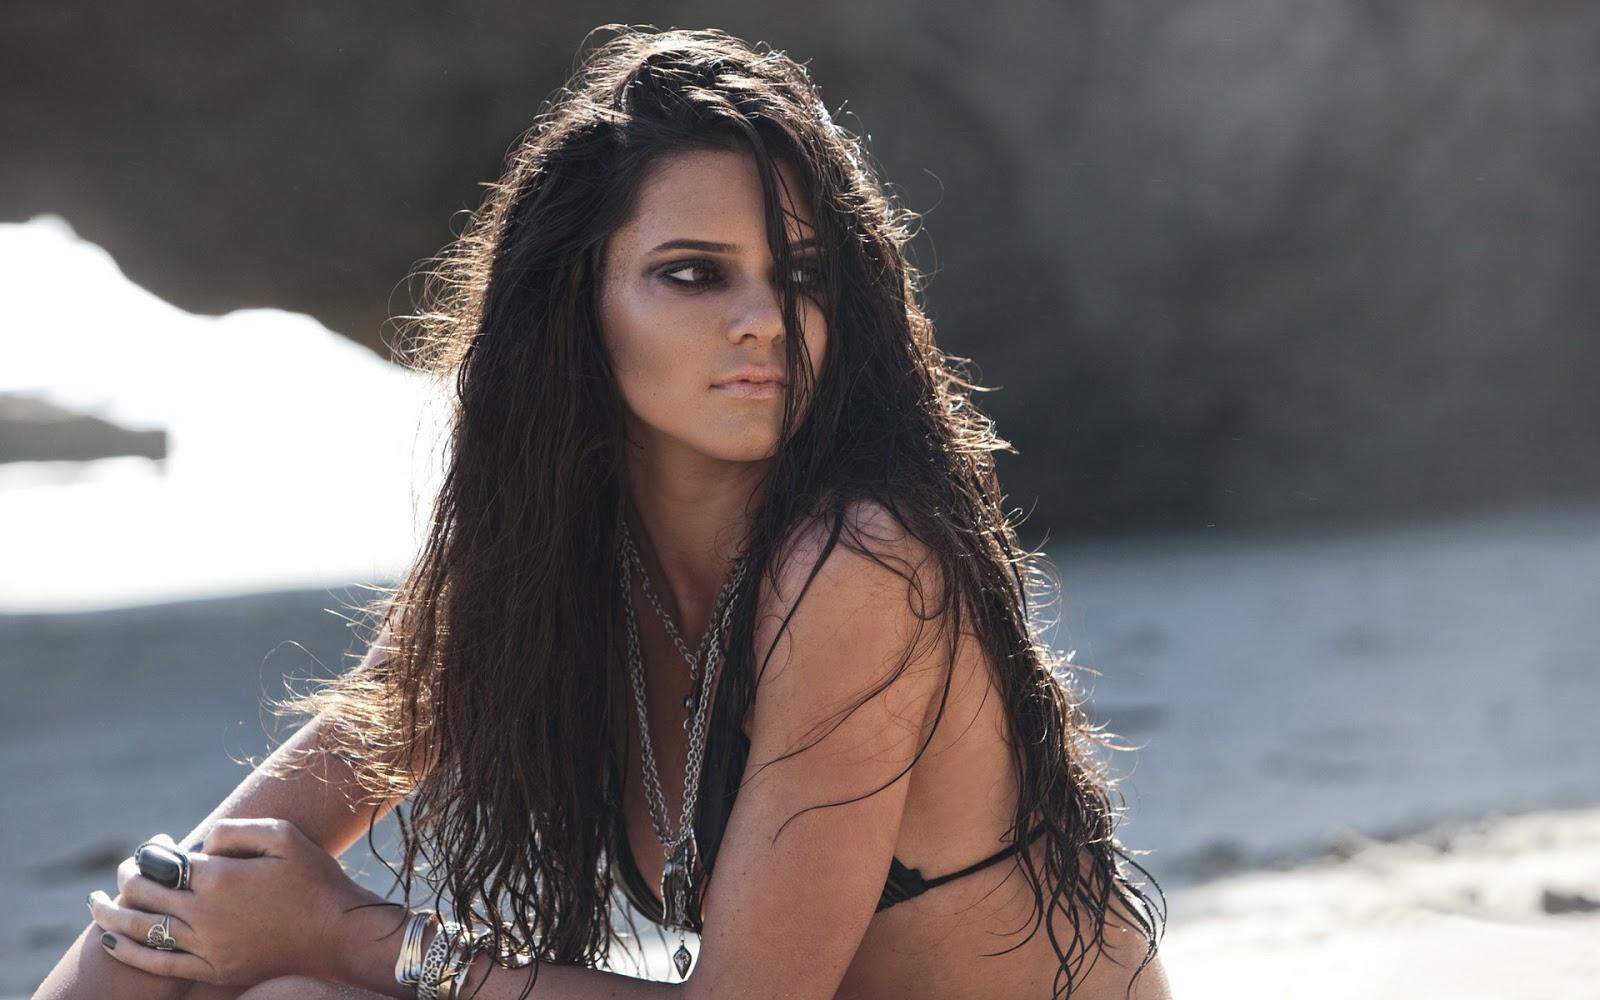 Hot Kendall JennerKendall Jenner